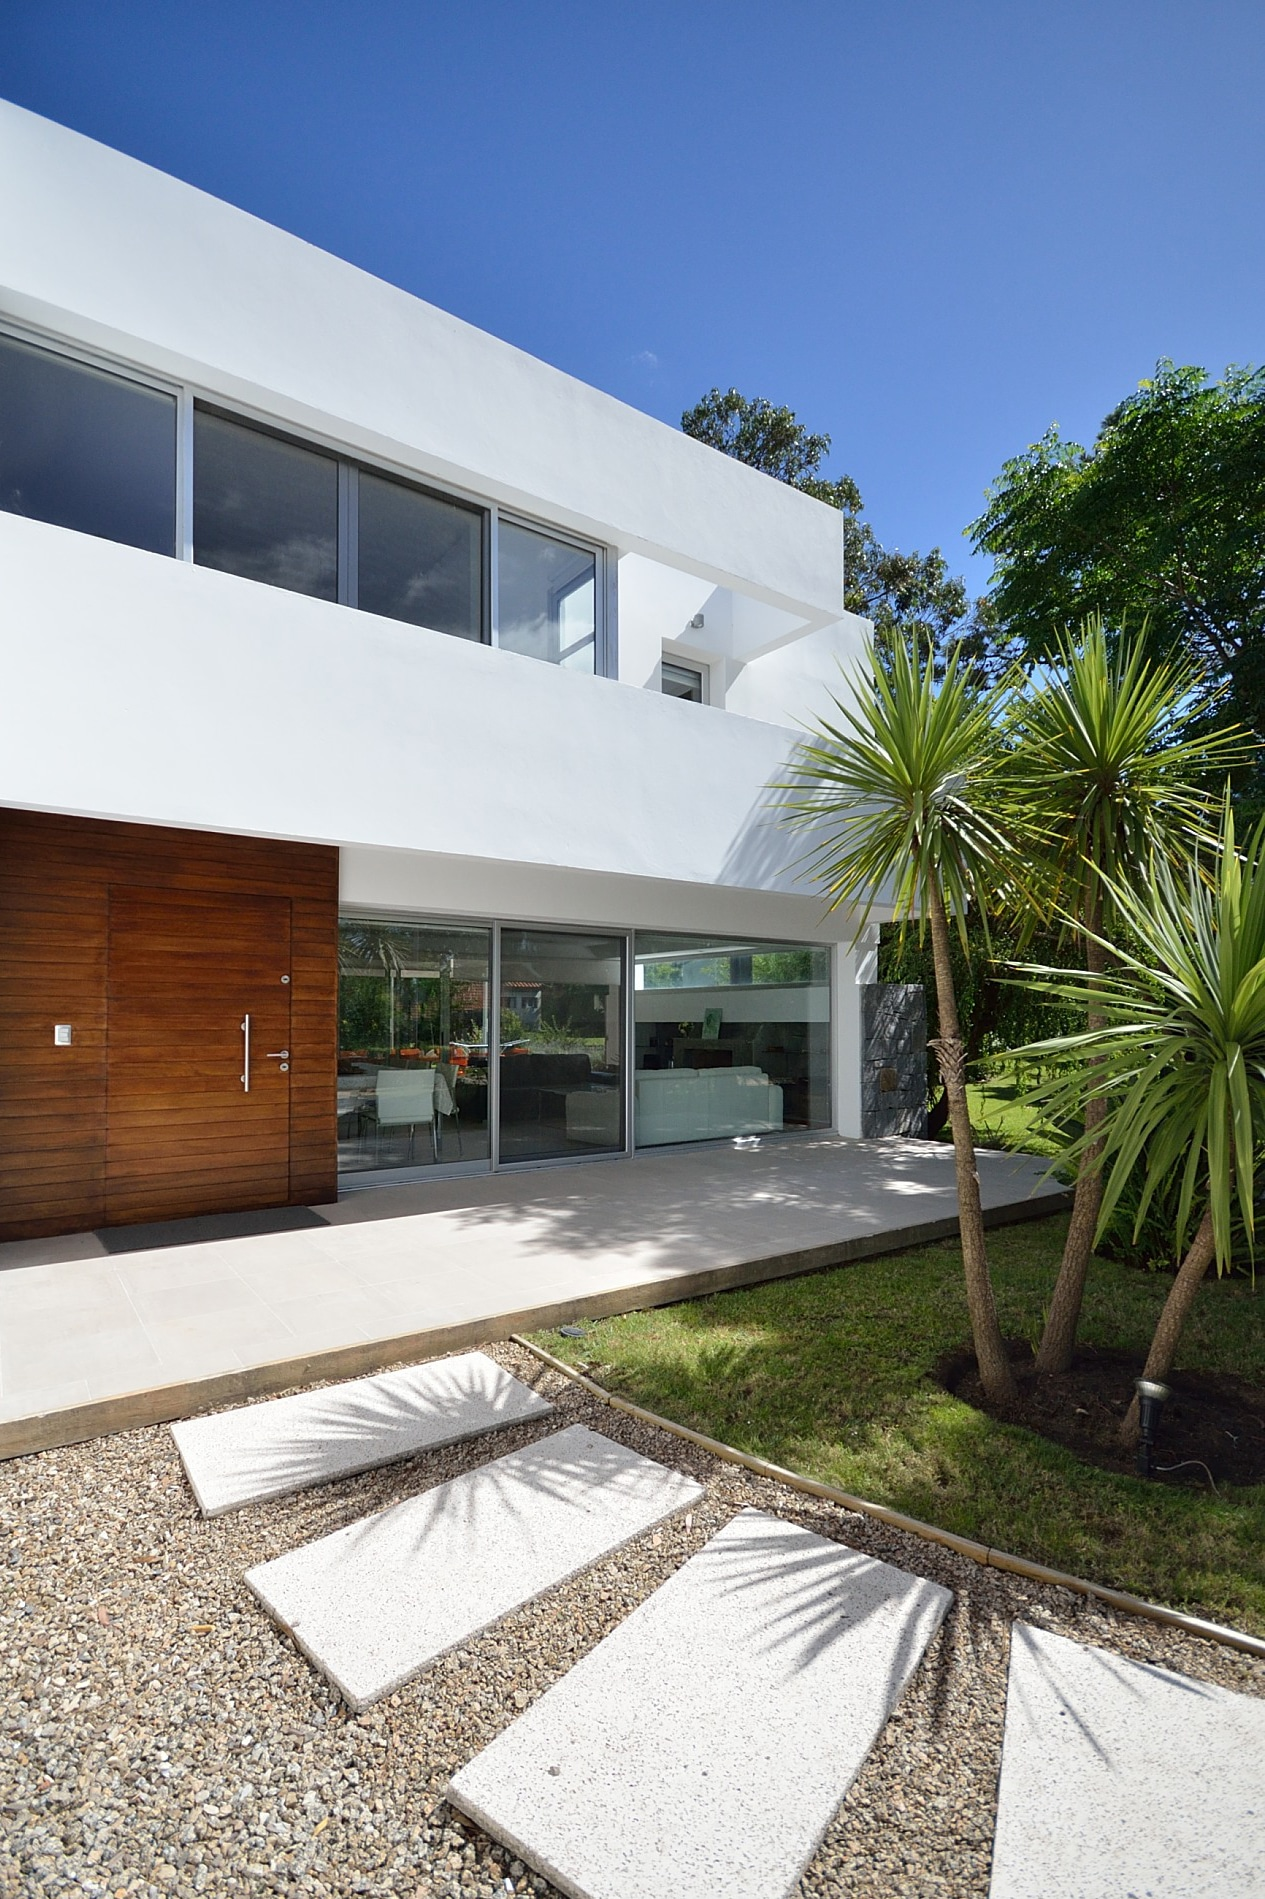 Casa brava house canexel for Casa moderna blanca